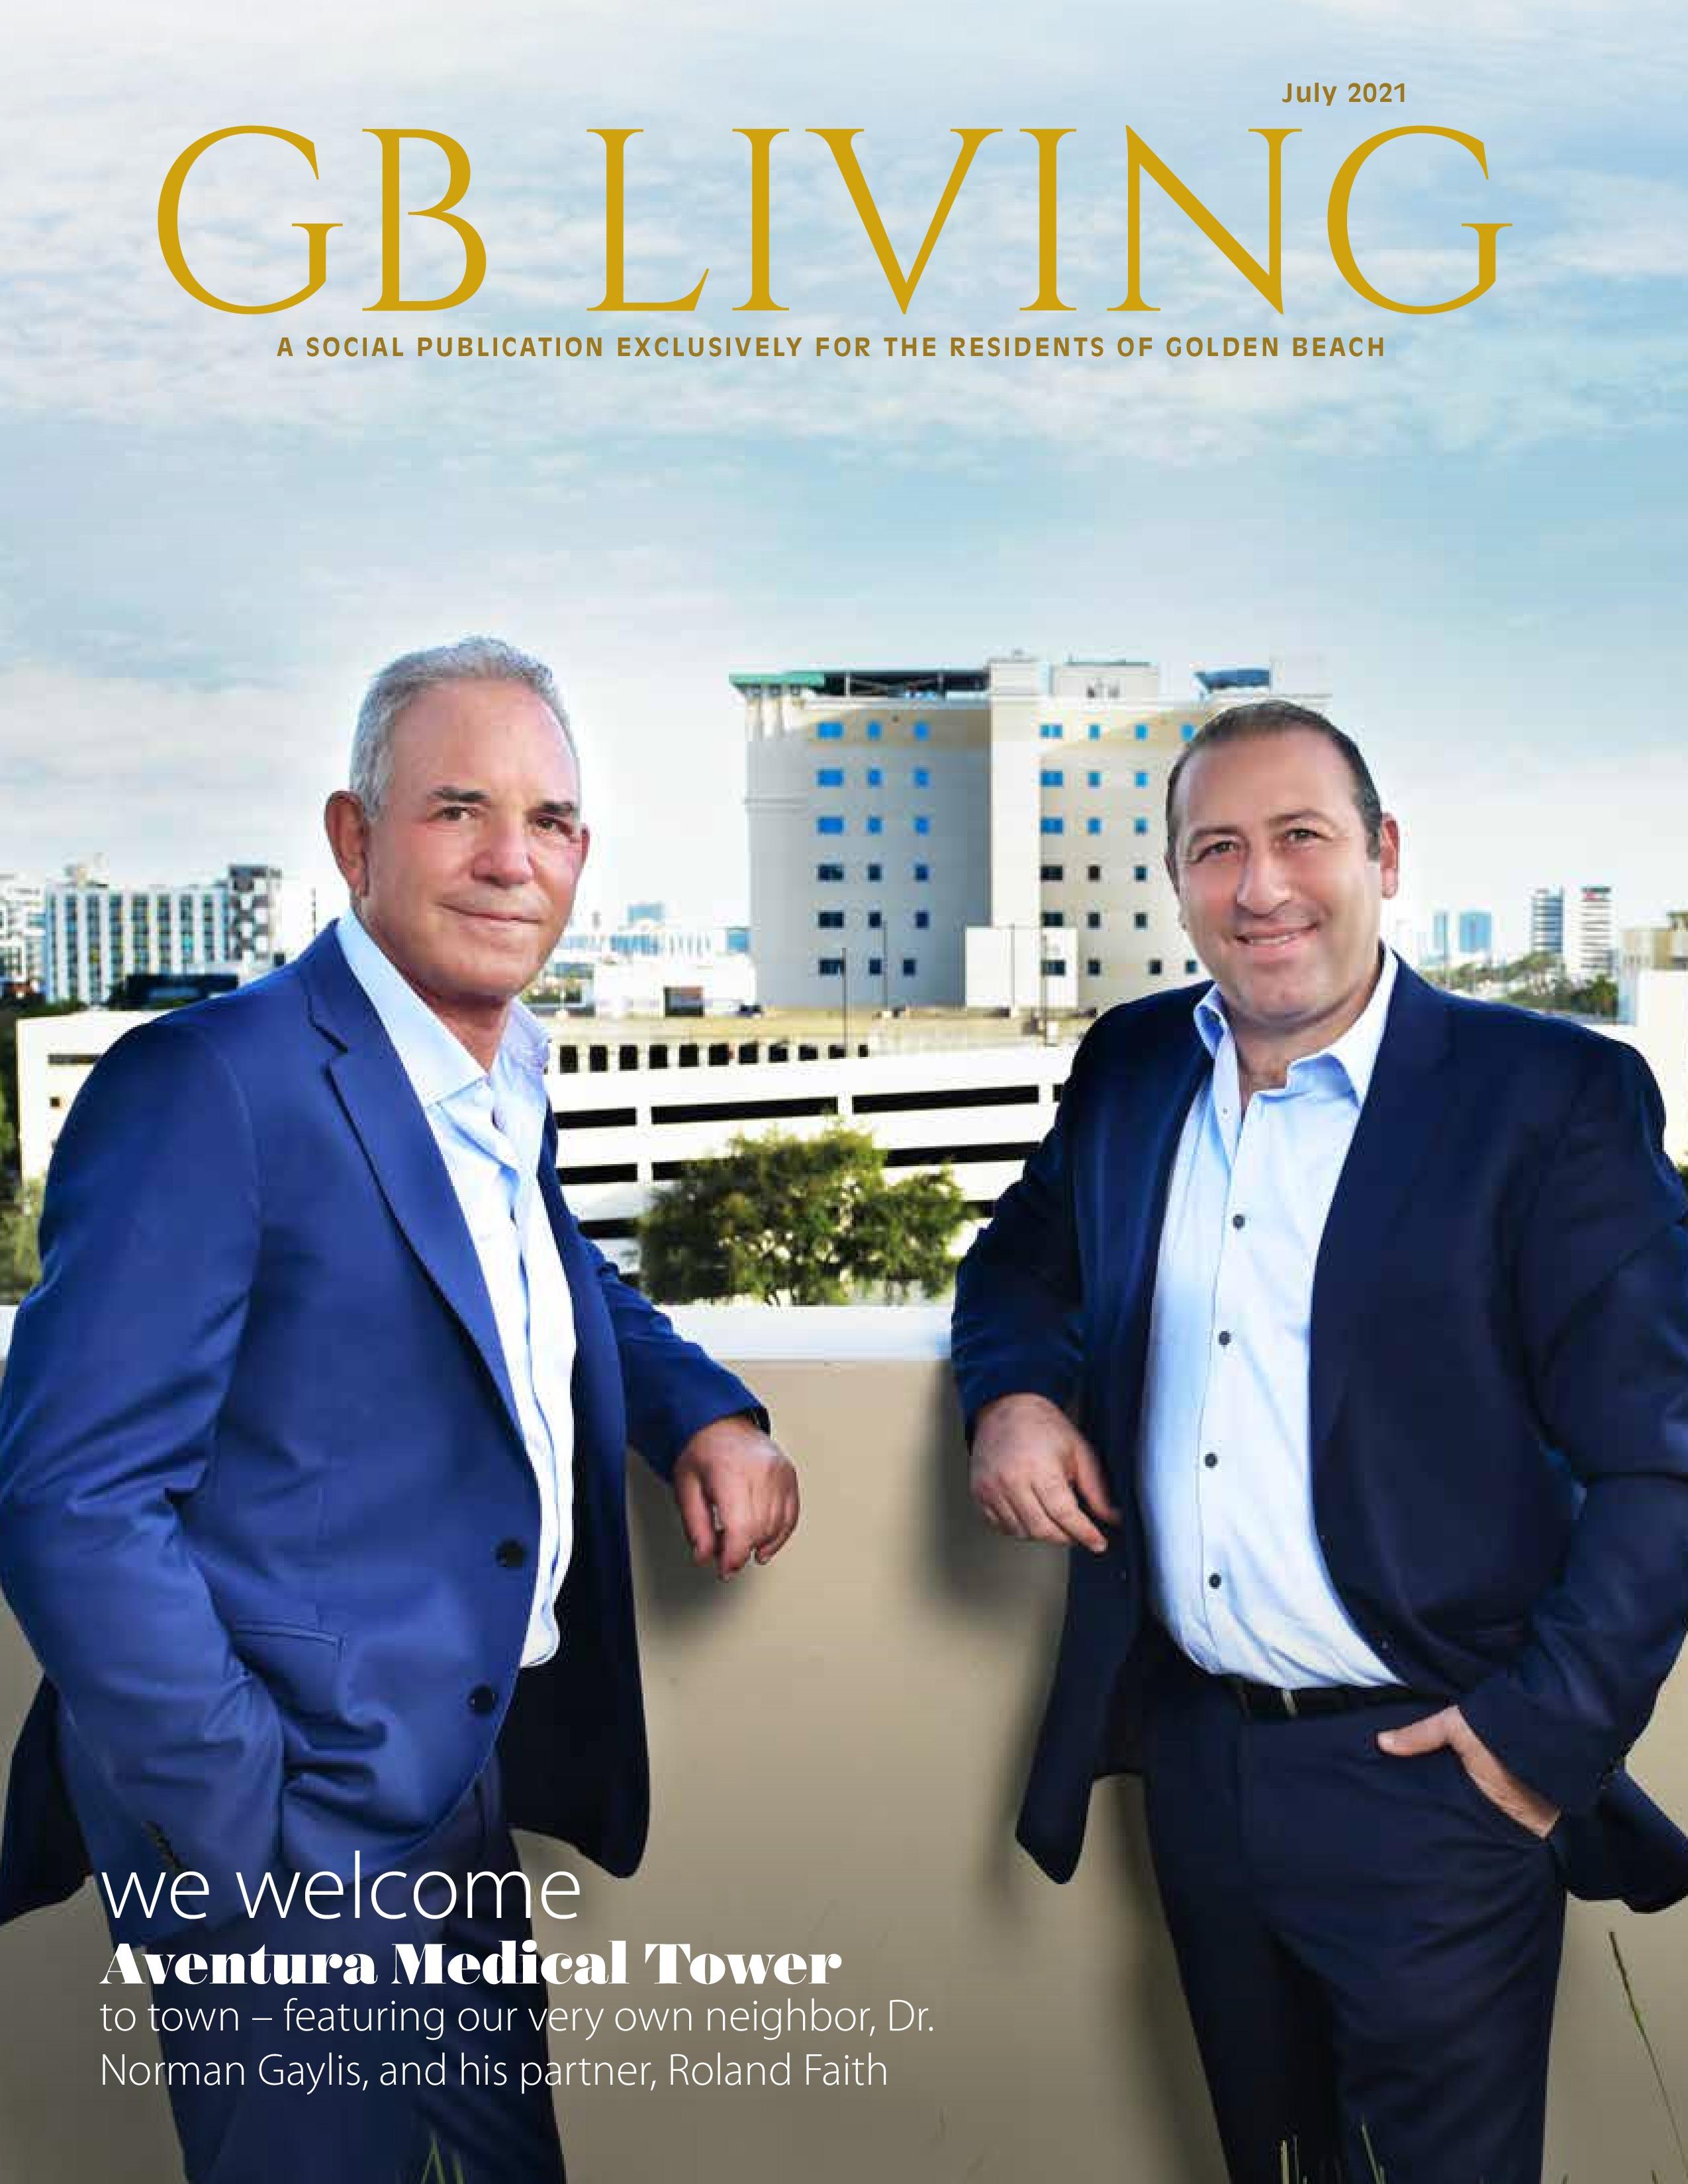 GB Living 2021-07-01